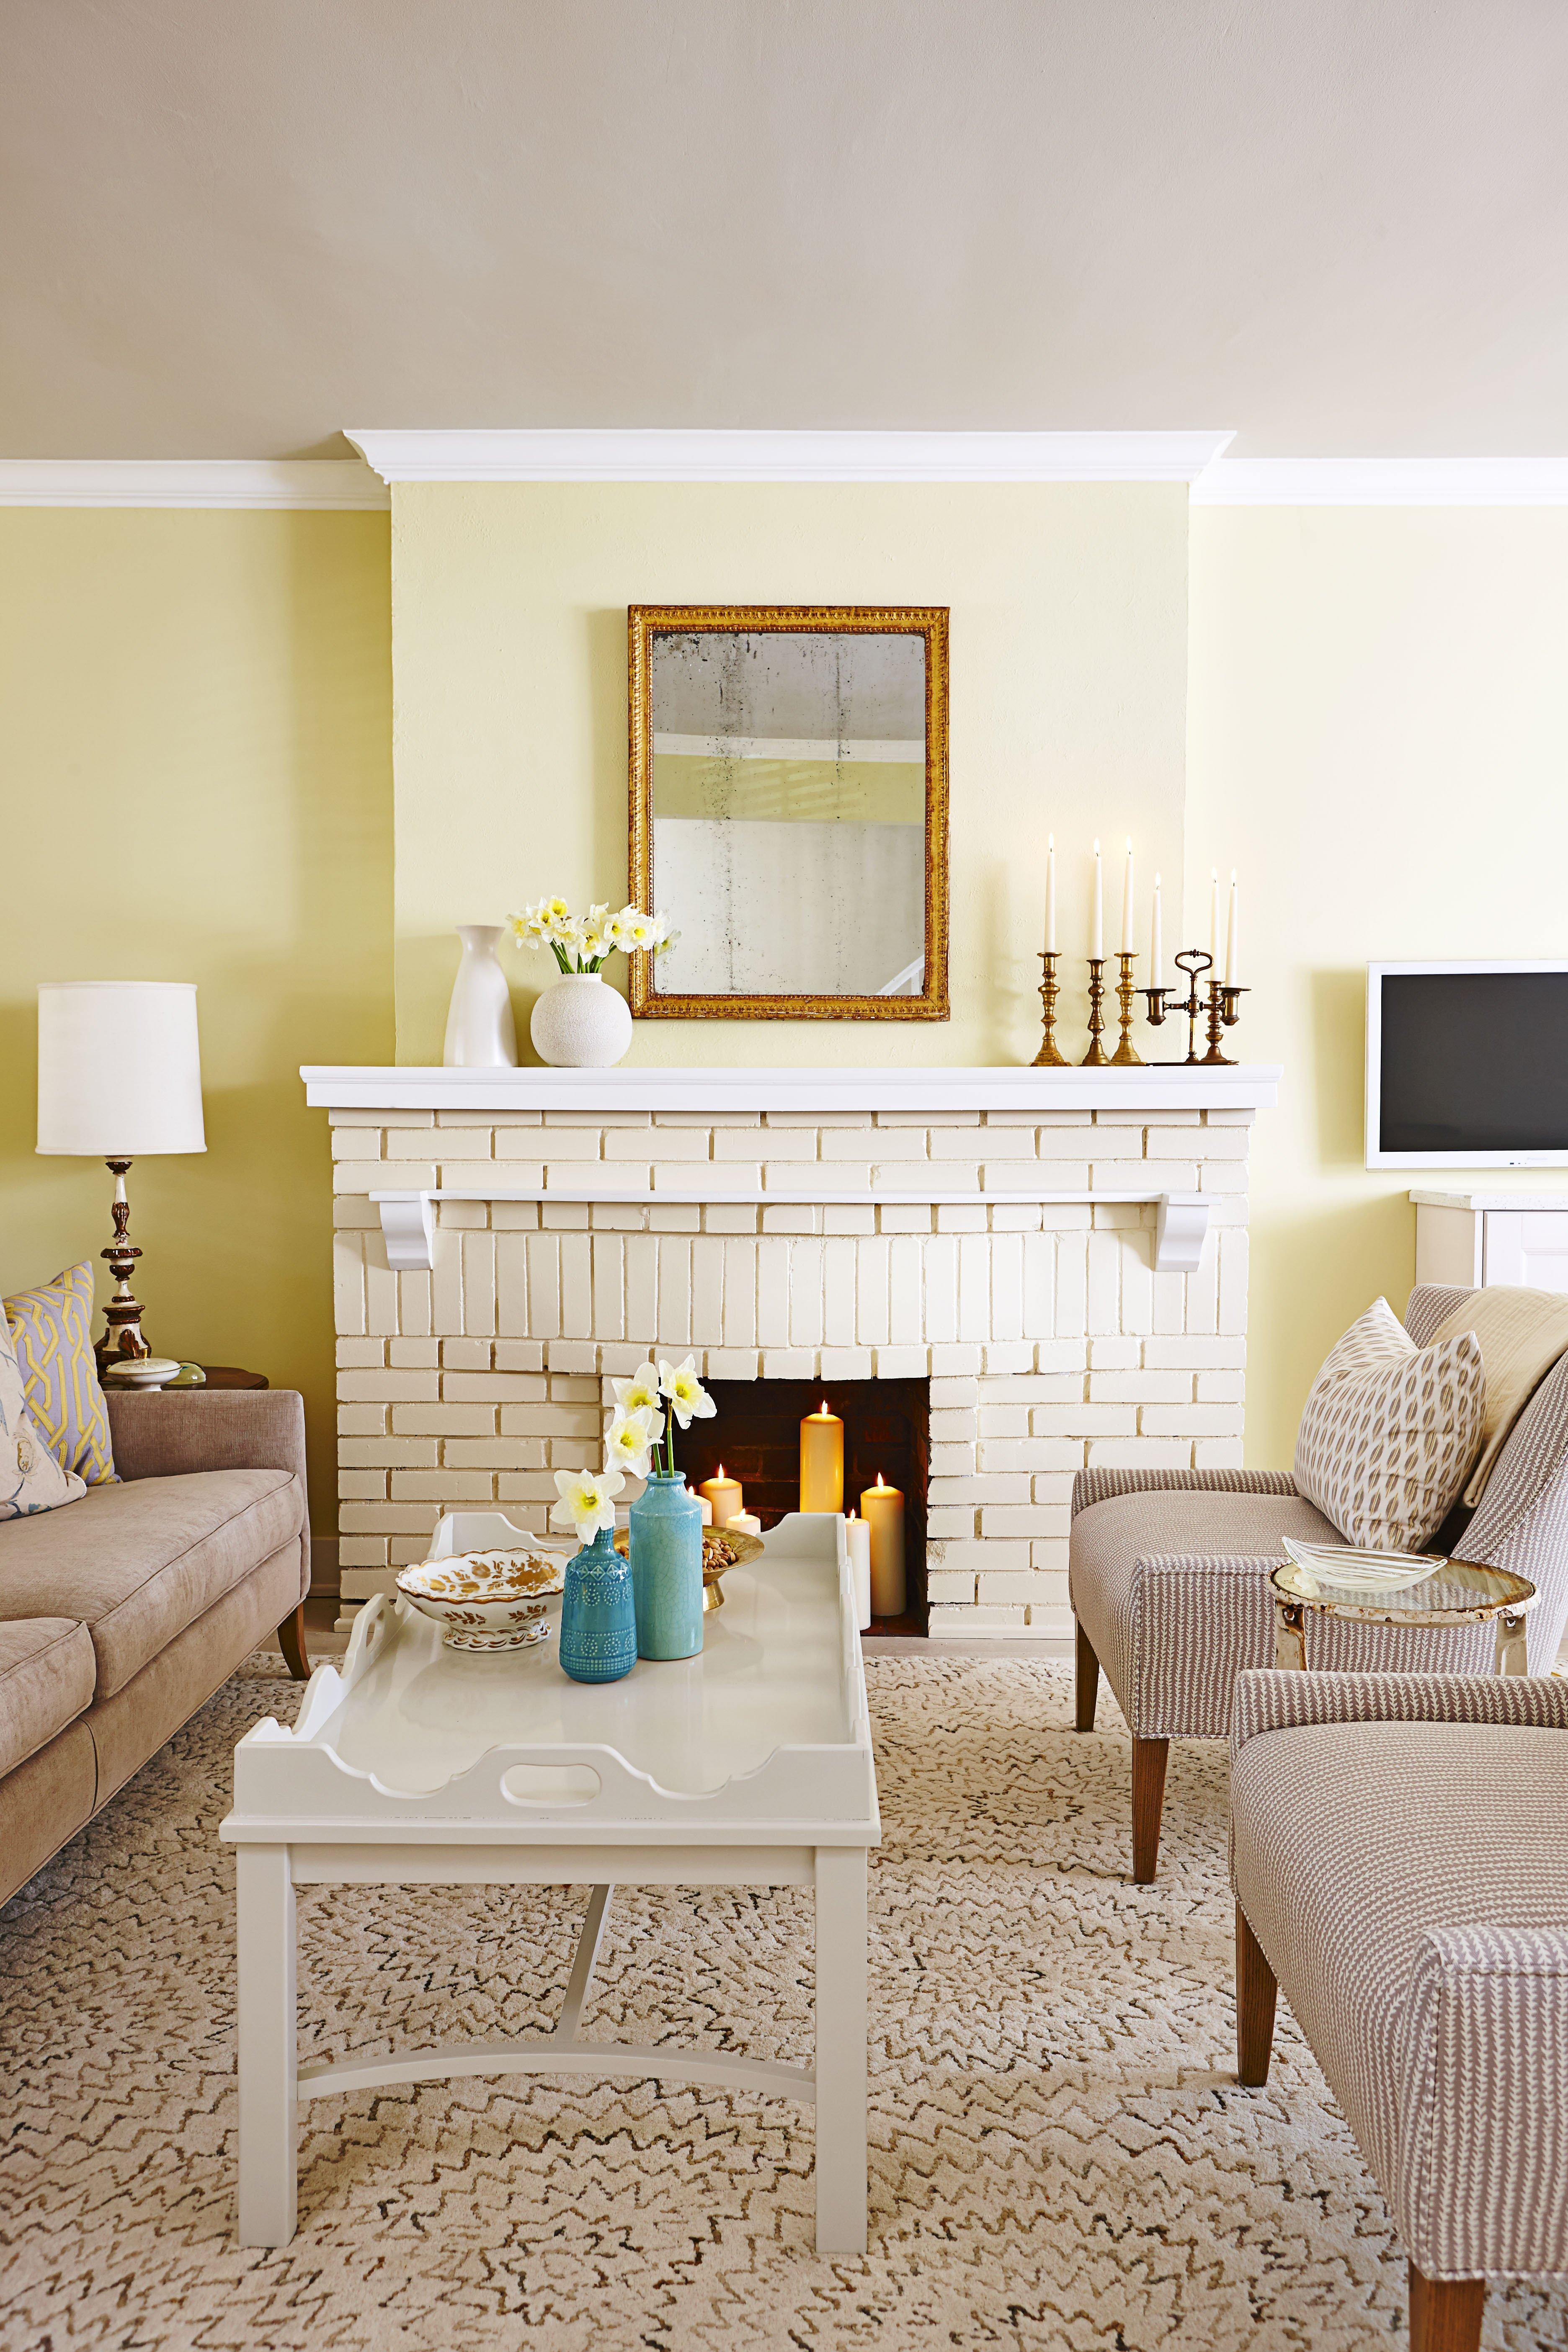 Living Room Decor with Fireplace Design Tricks From Sarah Richardson Sunny Serene House tour